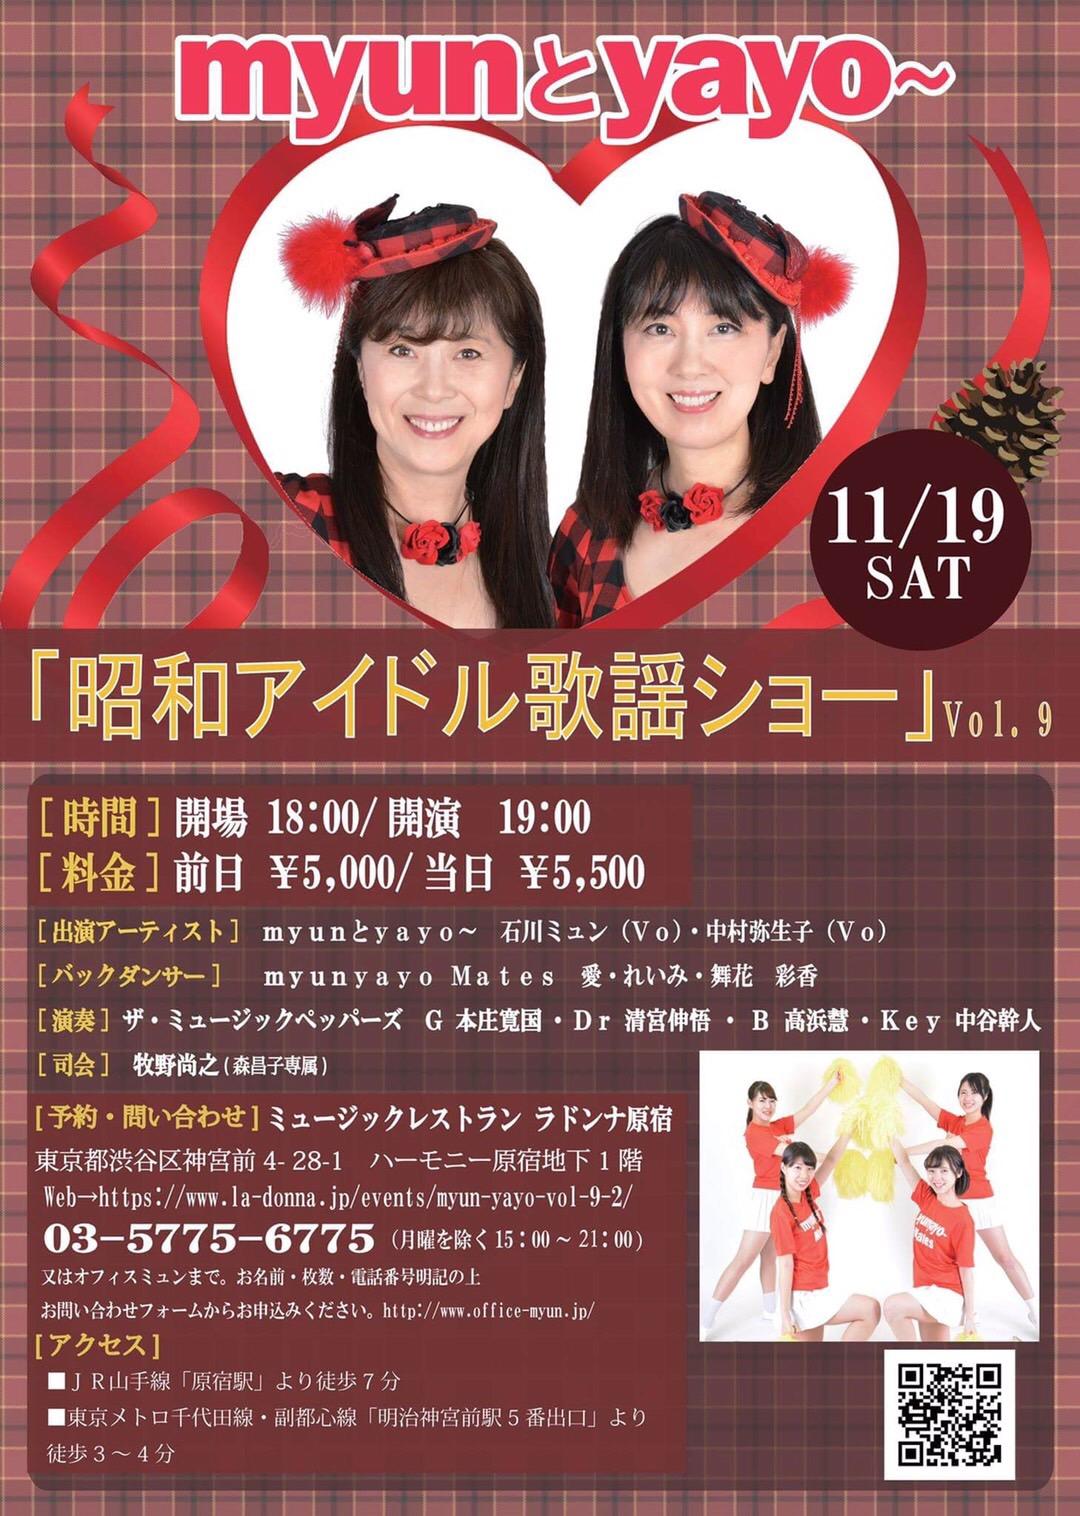 myunとyayo~ 公式ライブ「昭和アイドル歌謡ショー」 vol.9